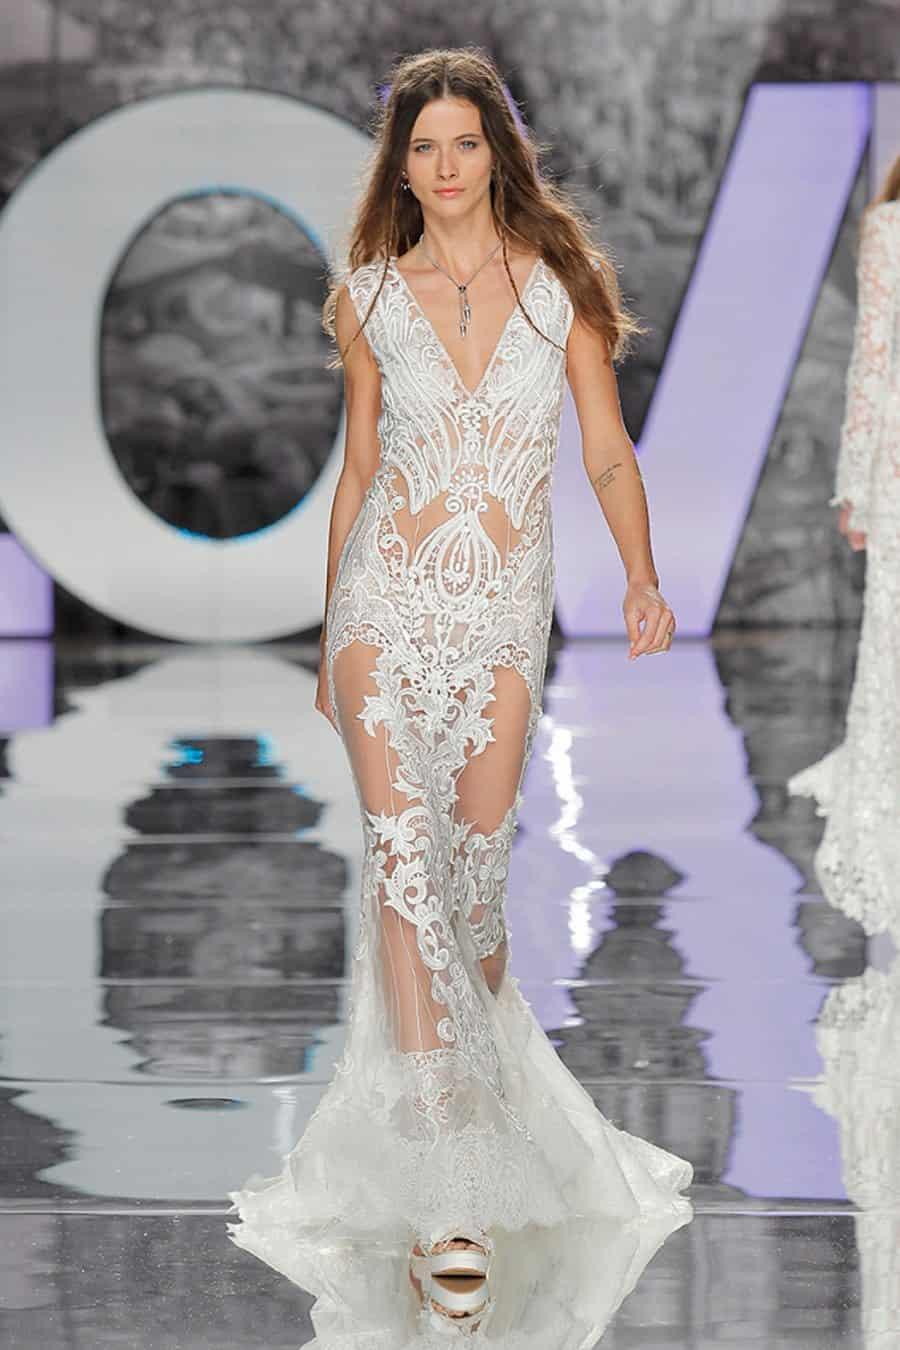 agudes-yolancris-weddingdress-boho-folk-dress-weddingdress-fashion-bohodress-highfashion